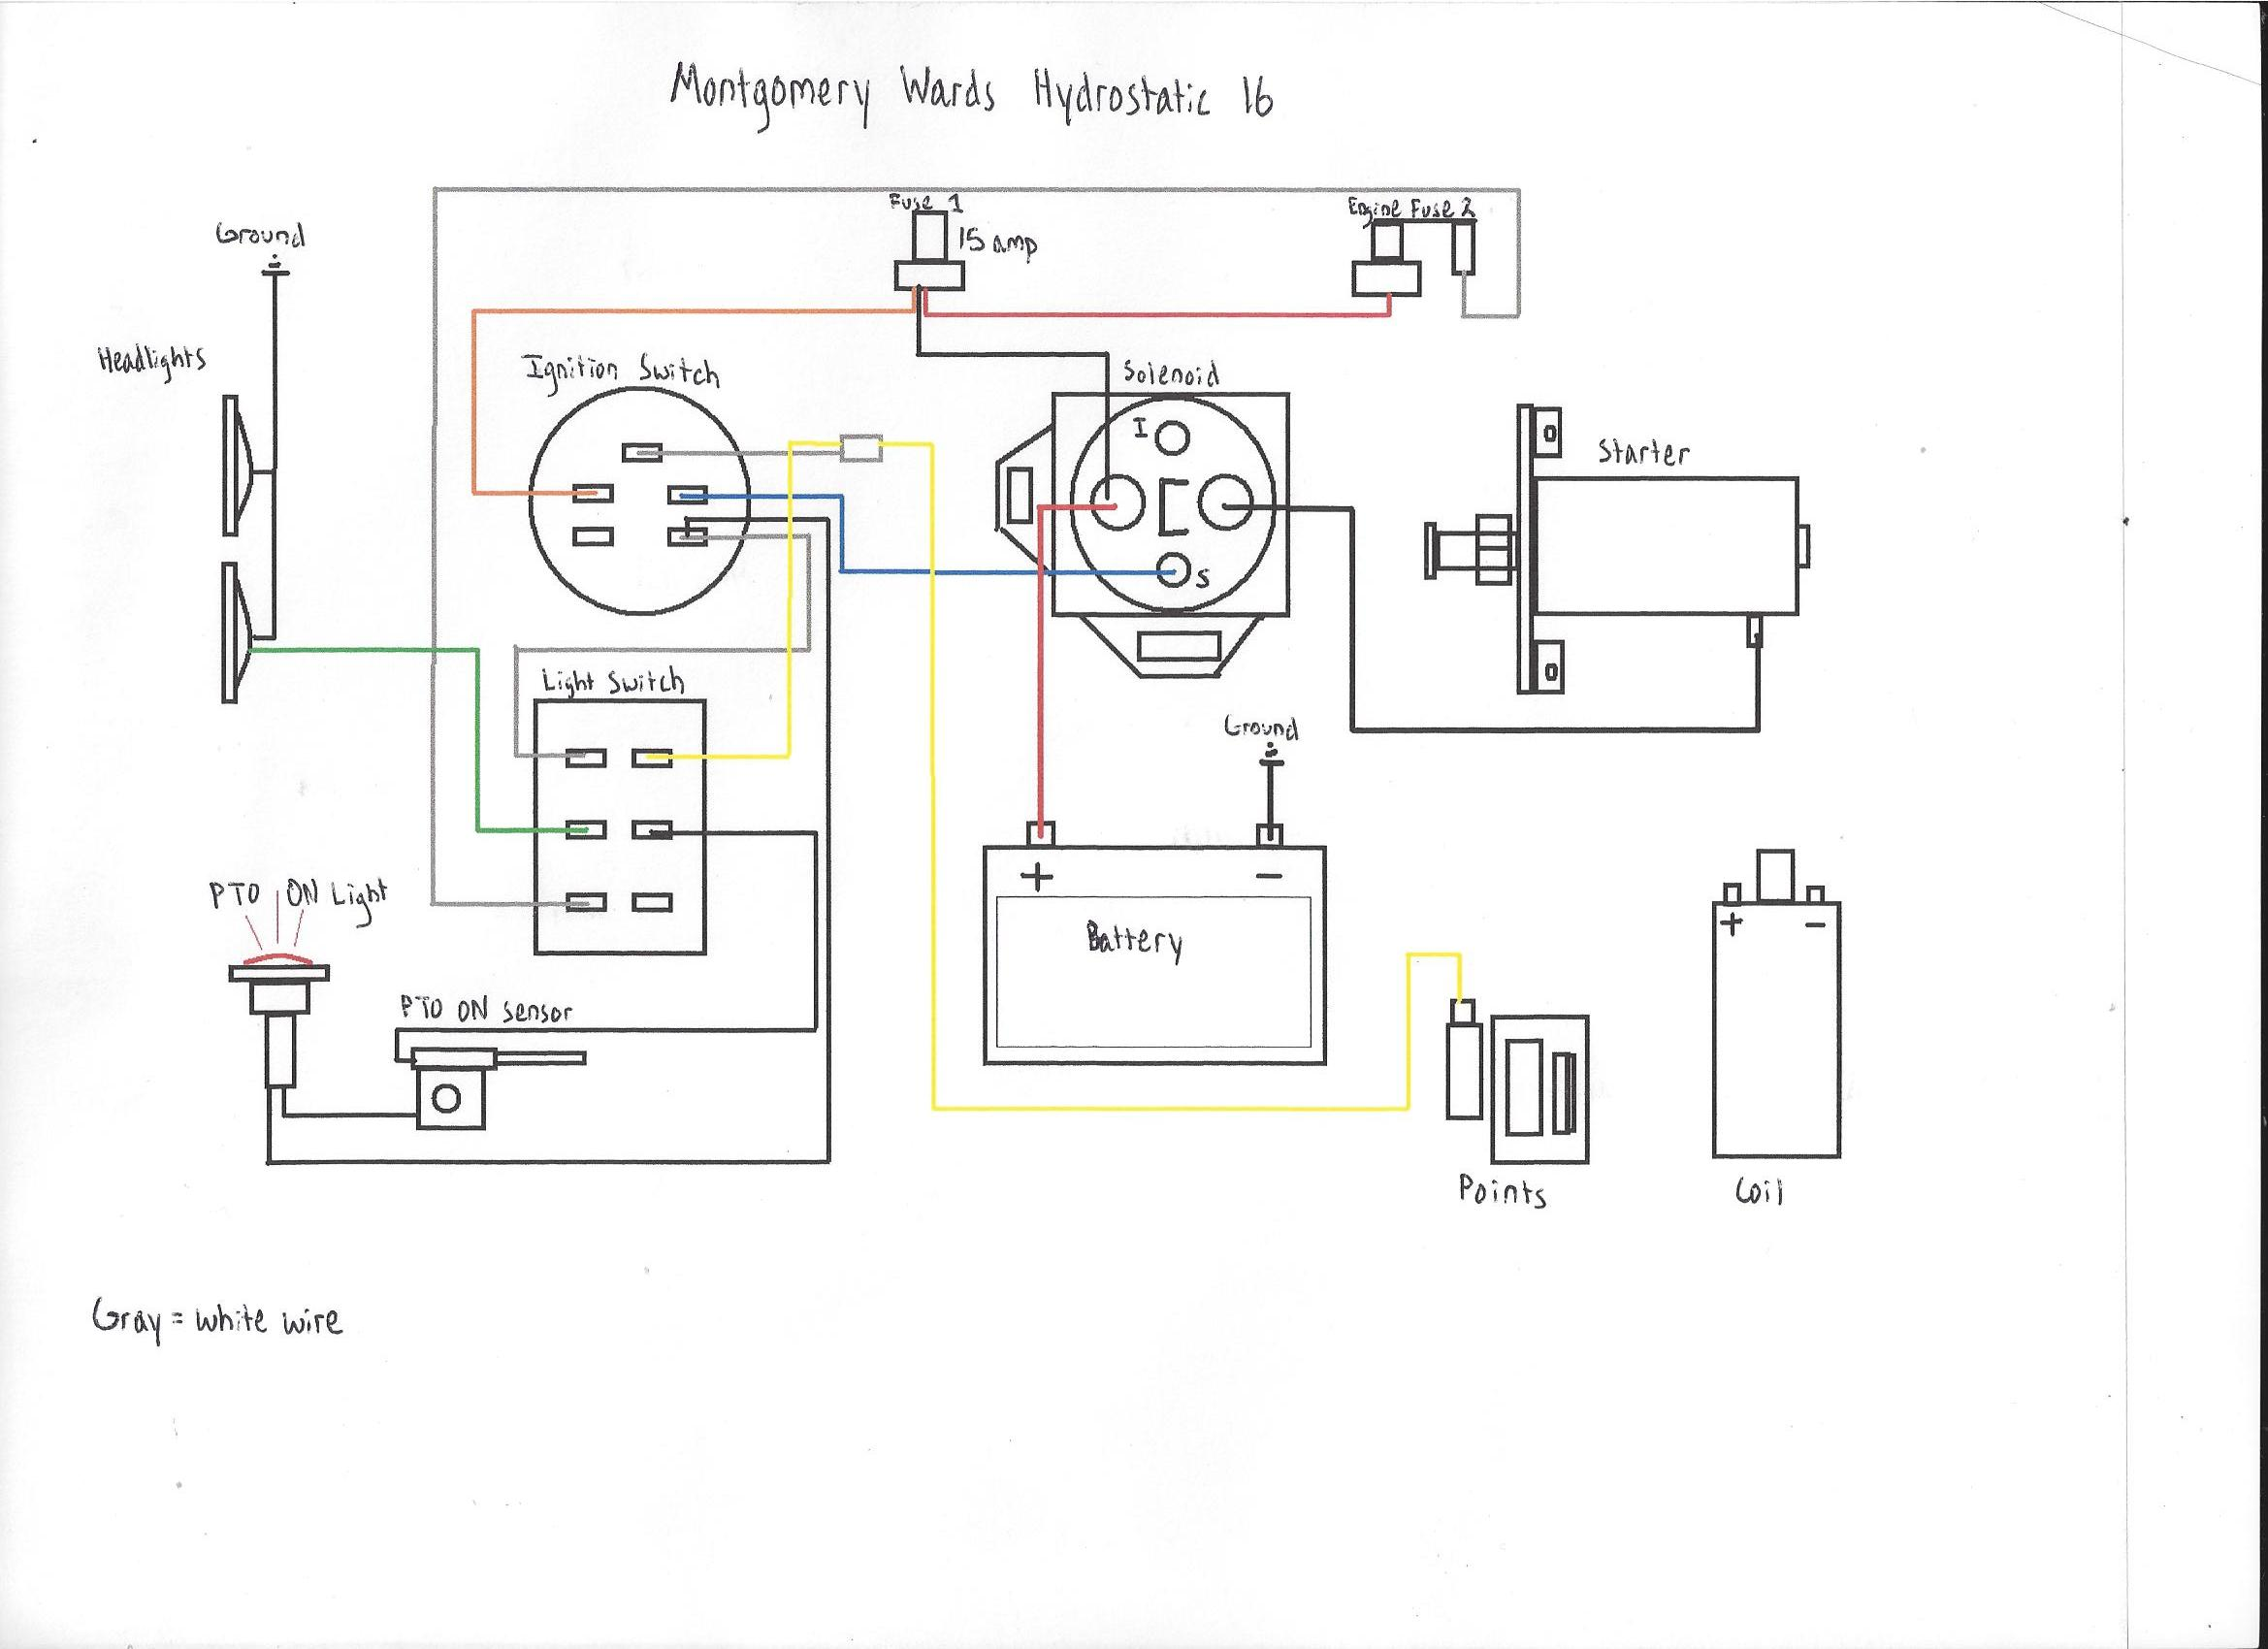 Tran Temp Gauge Wiring Diagram furthermore 30   Bosch Relay Wiring Diagram besides Stewart Warner Ammeter Wiring Diagram additionally Stewart Warner Gauges Wiring Diagrams likewise Off Delay Relay Car. on spdt relay diagram